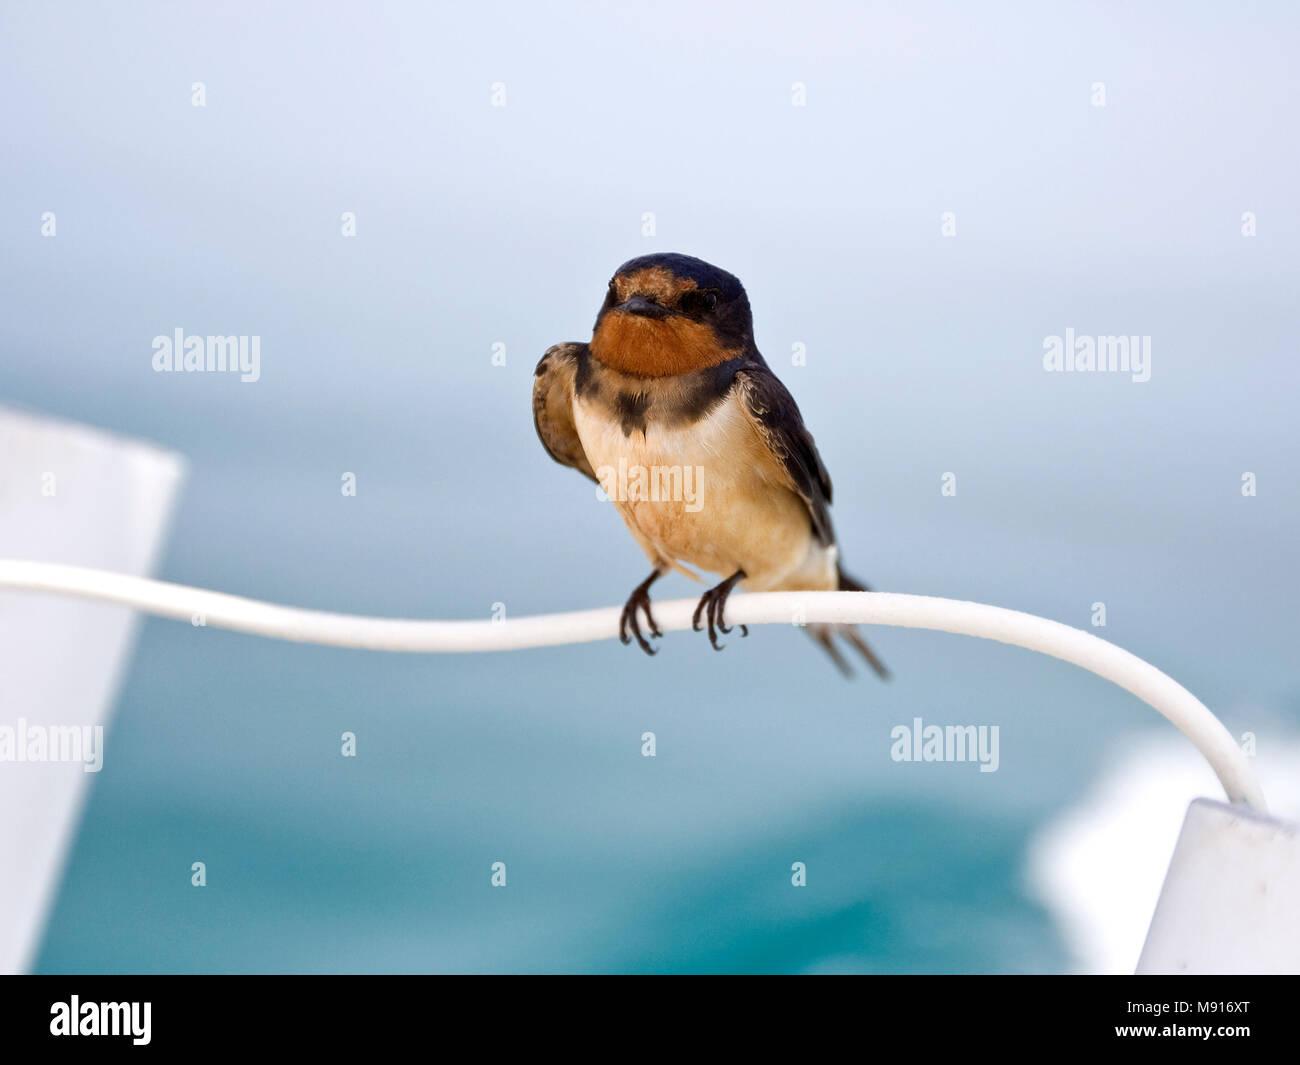 Amerikaanse Boerenzwaluw (ondersoort erythrogaster) uitrustend op reling van schip Yucatan Mexico, American Barn Swallow (subspecies erythrogaster) re - Stock Image